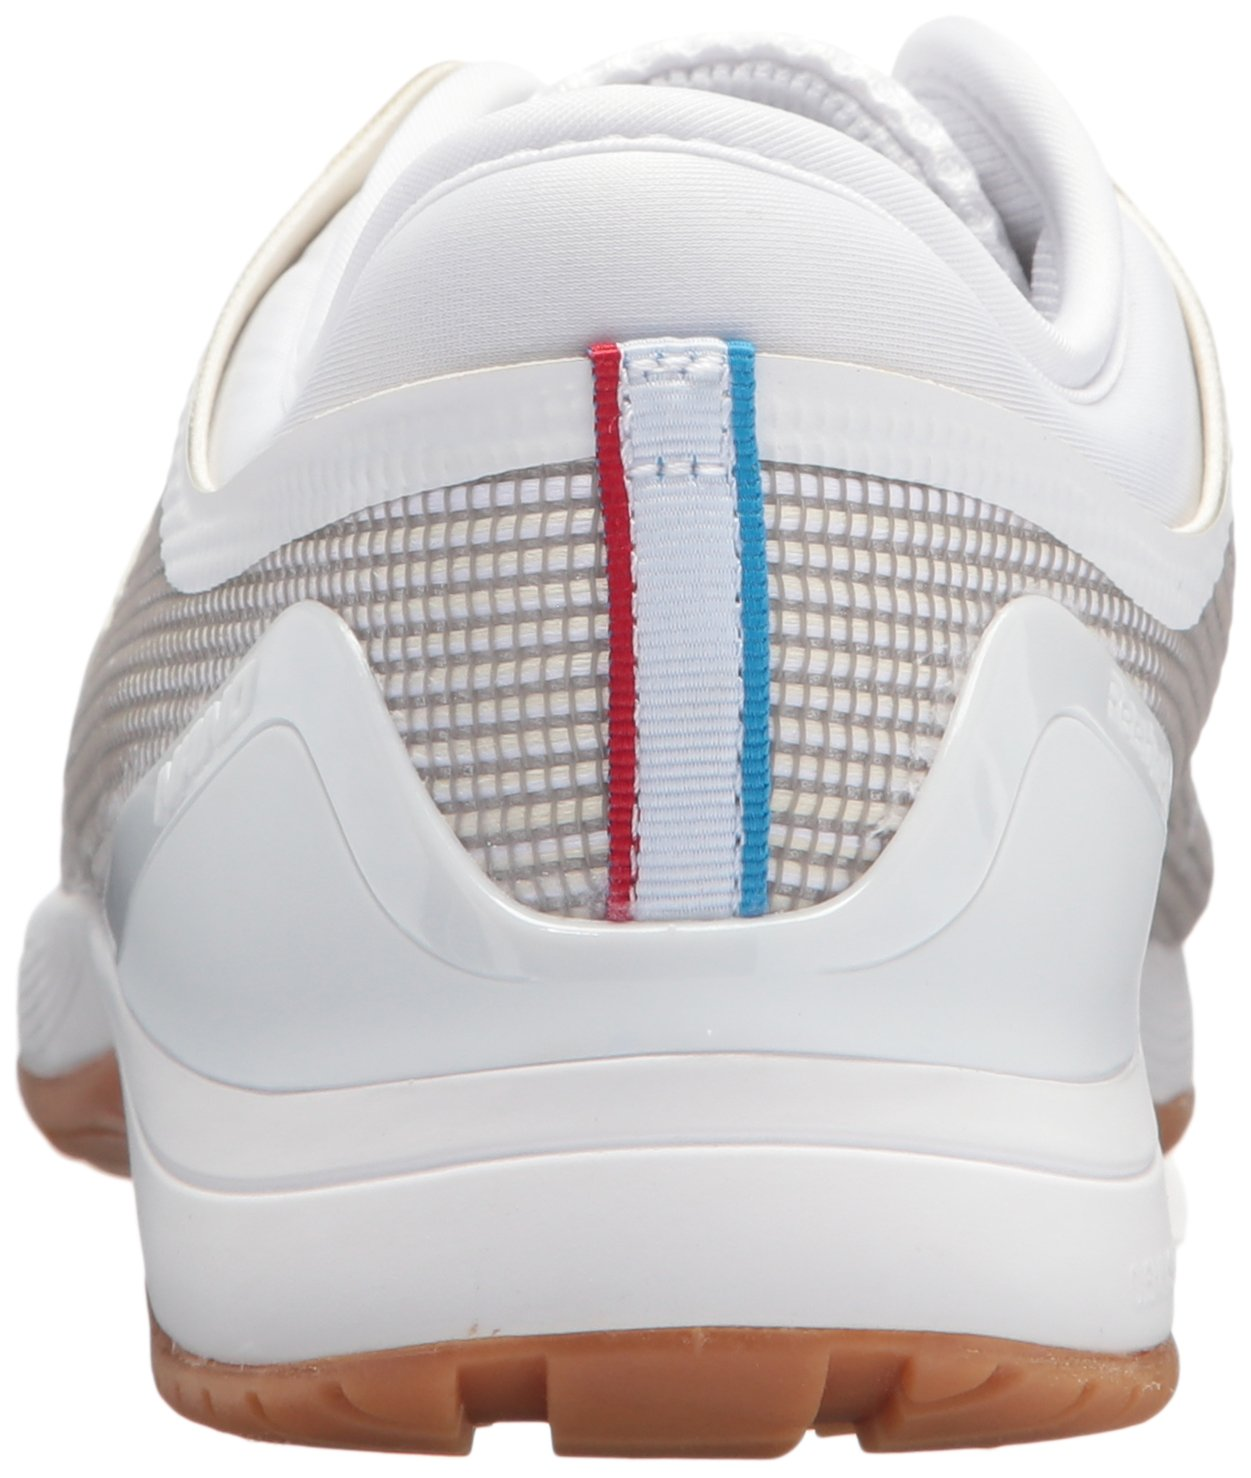 Reebok Women's Crossfit Nano 8.0 Flexweave Cross Trainer B073XK5V46 7.5 B(M) US White/Classic White/Excellent Red/Blue/Gum